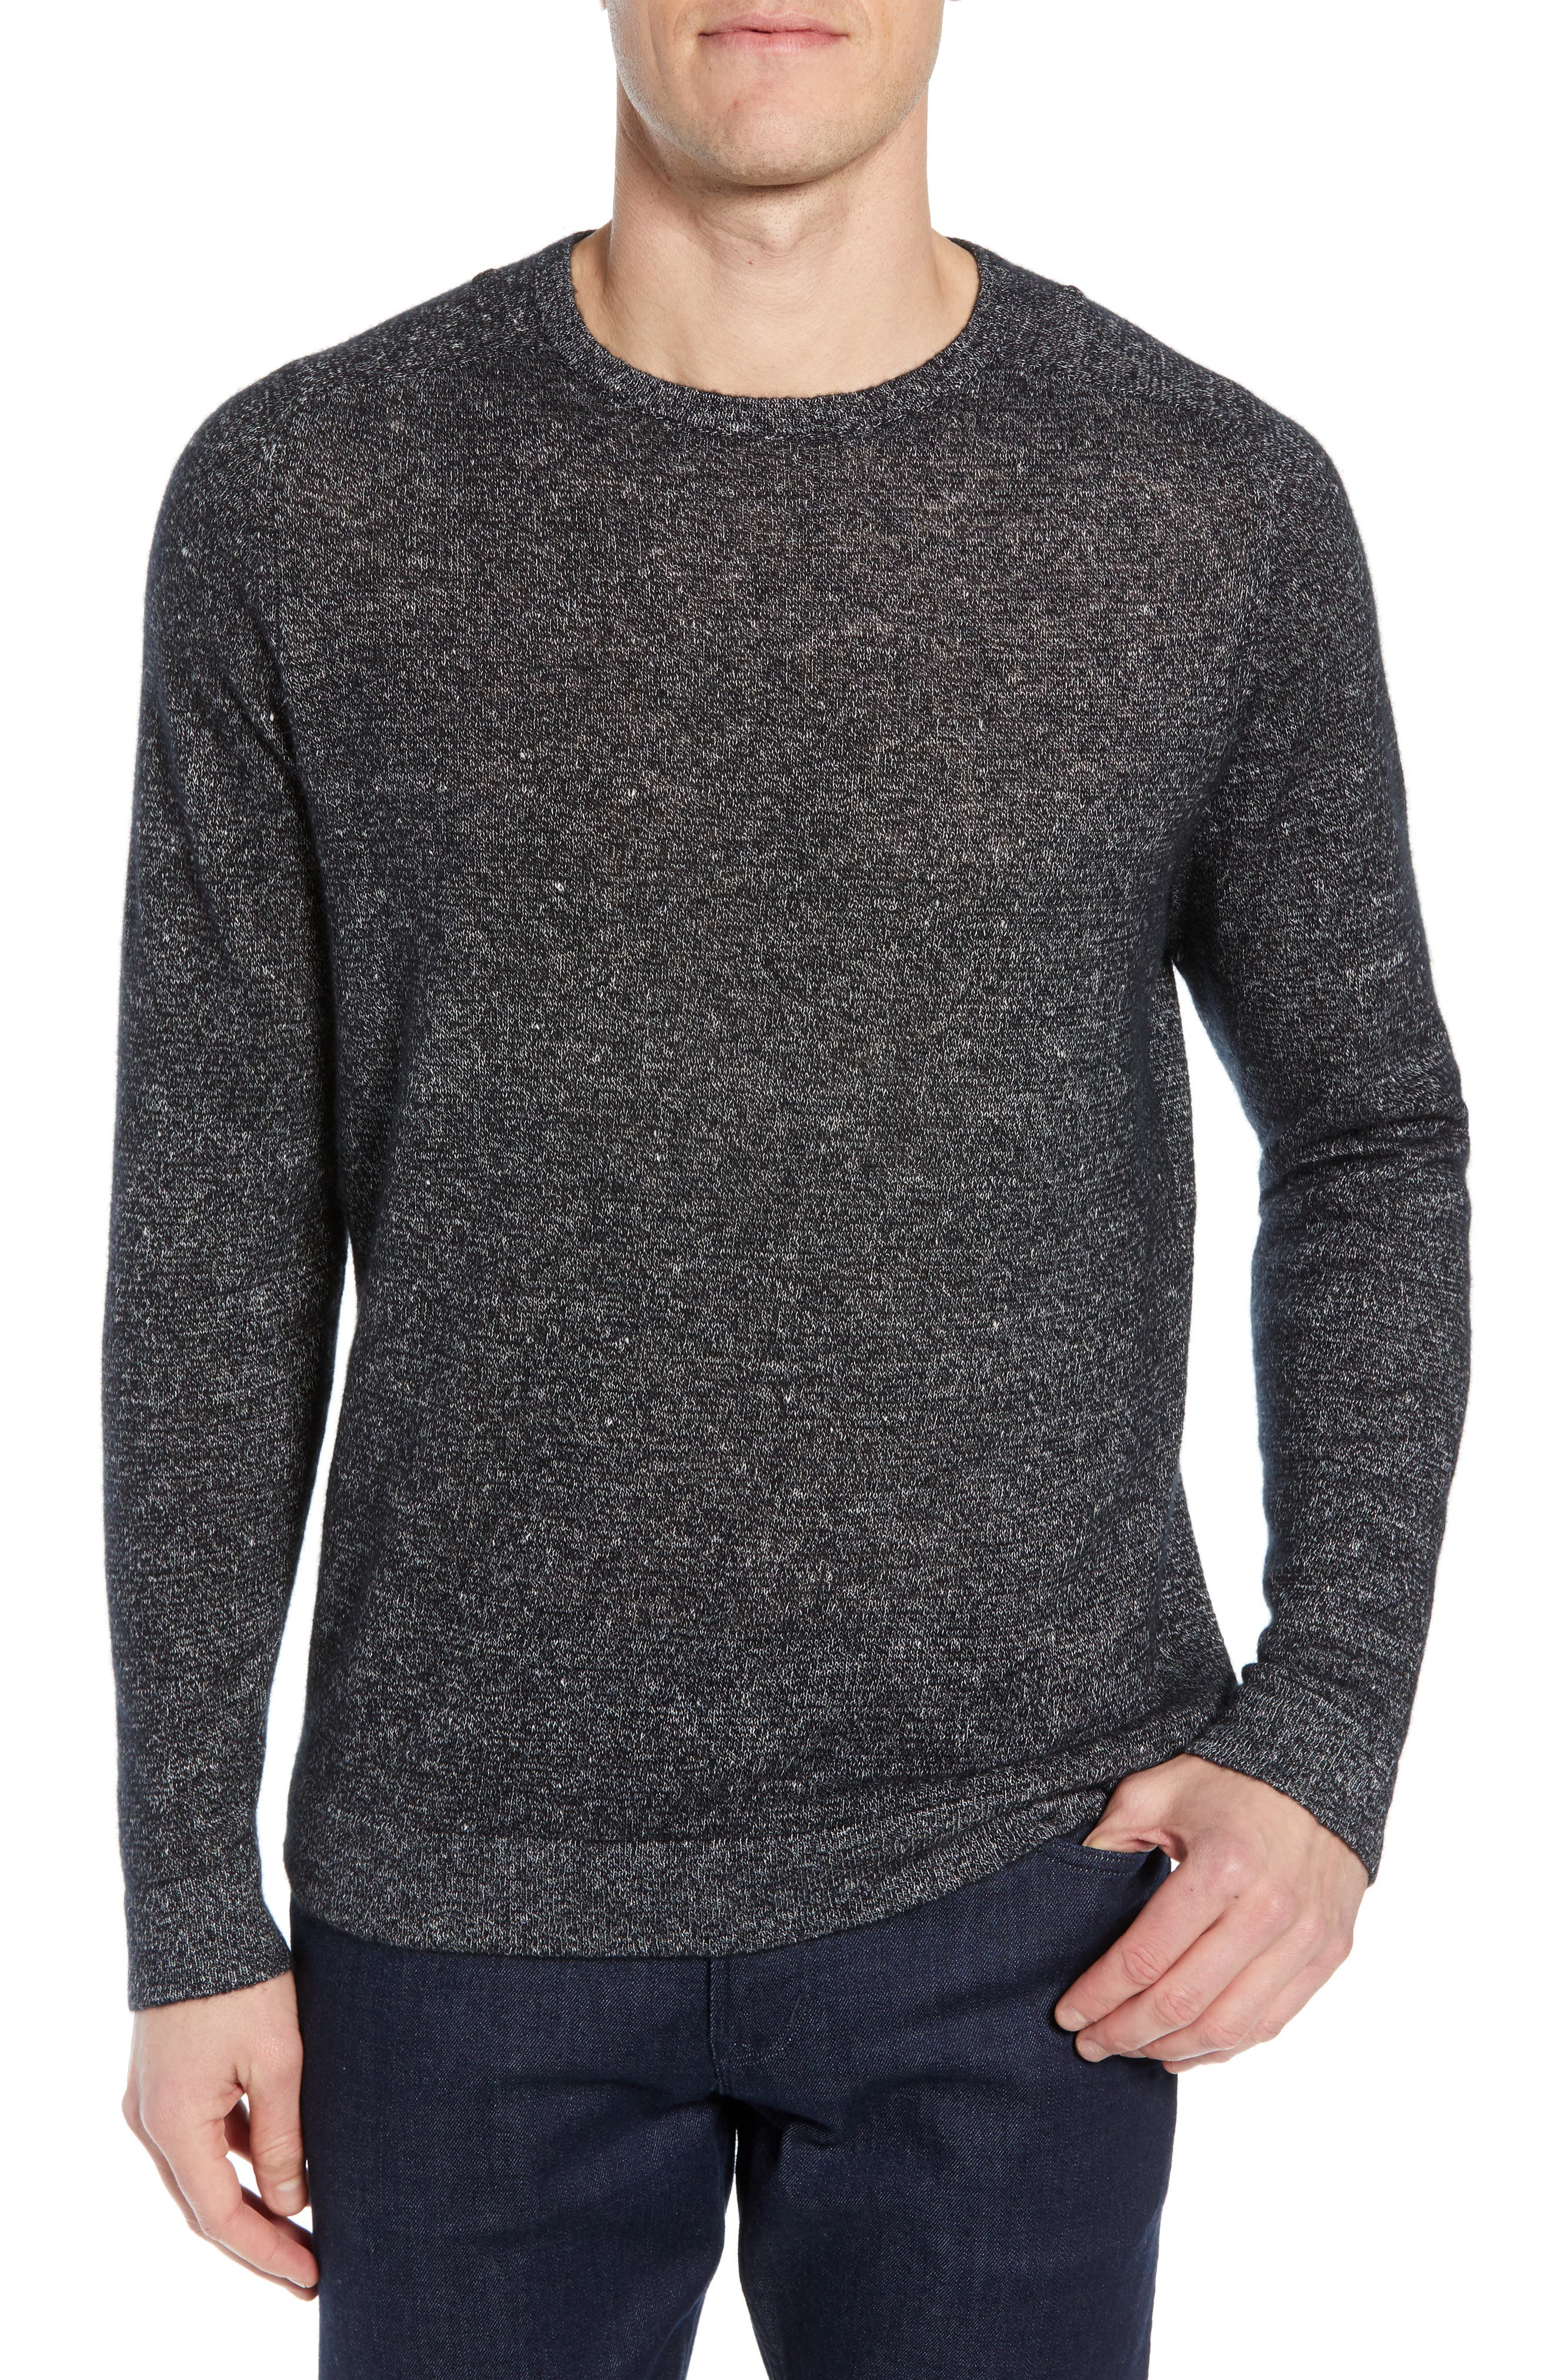 Nordstrom Signature Cashmere & Linen Crewneck Sweater